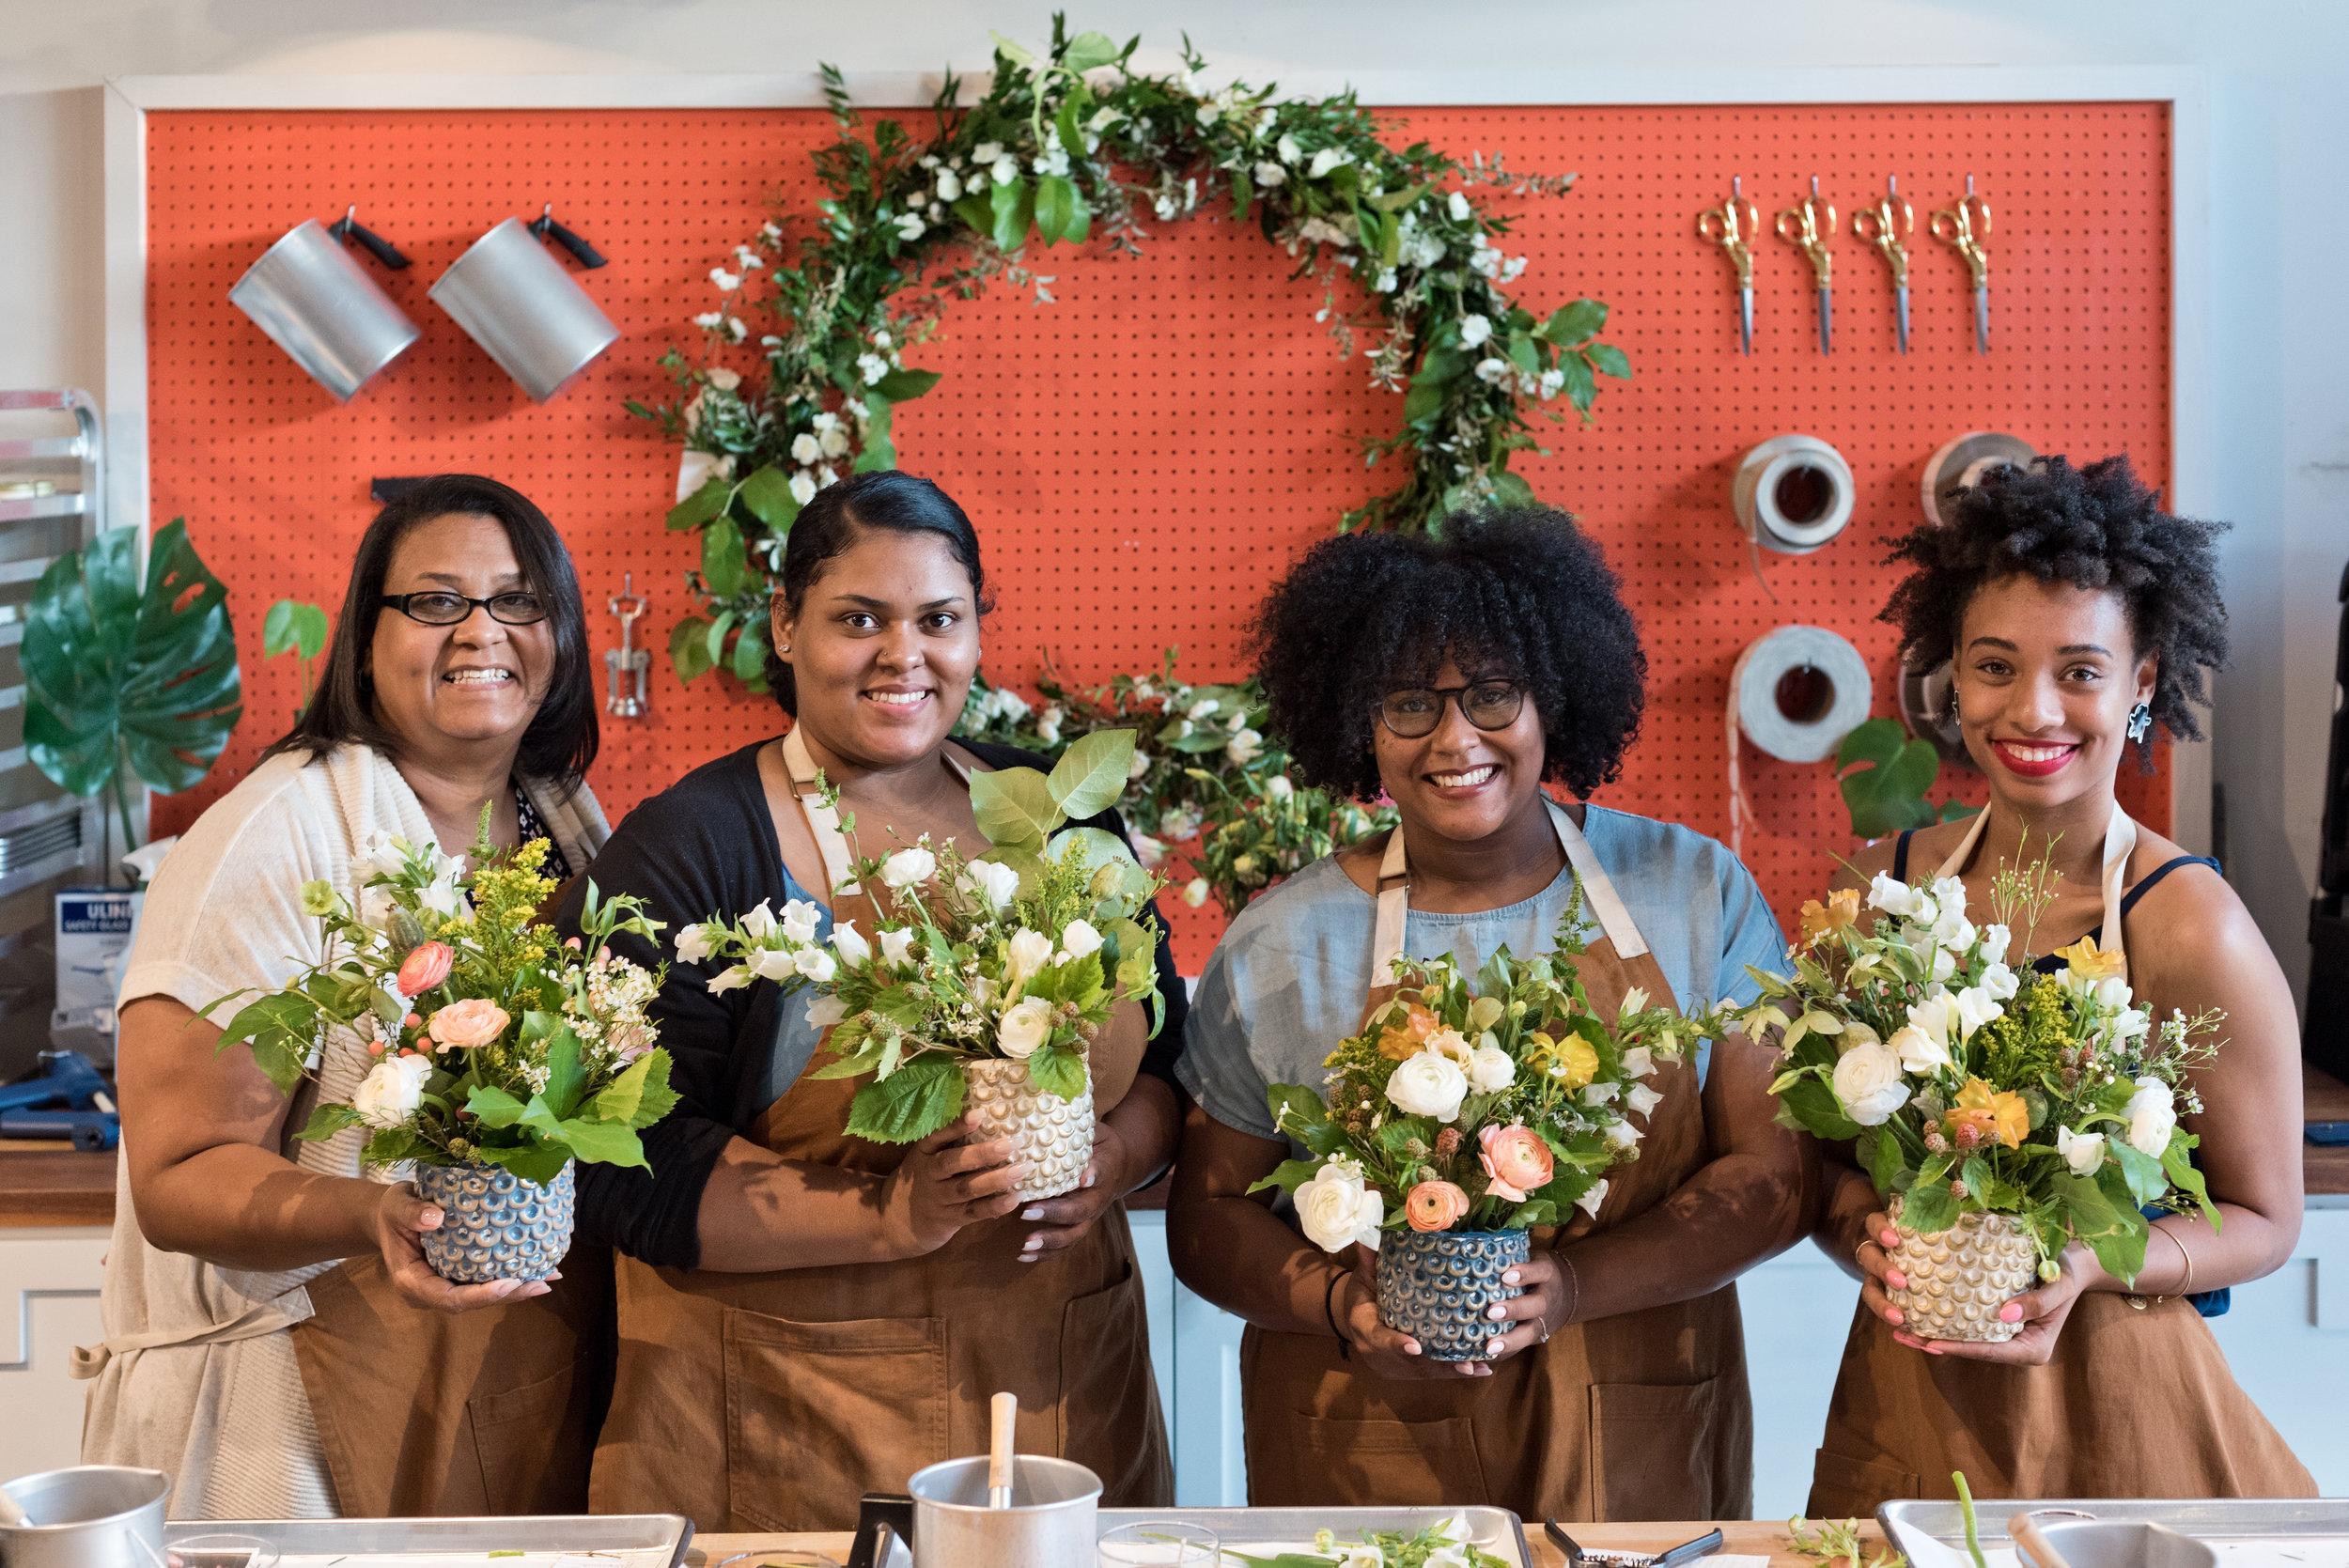 petal-and-fold-candlefish-workshop-july-2018-52.jpg